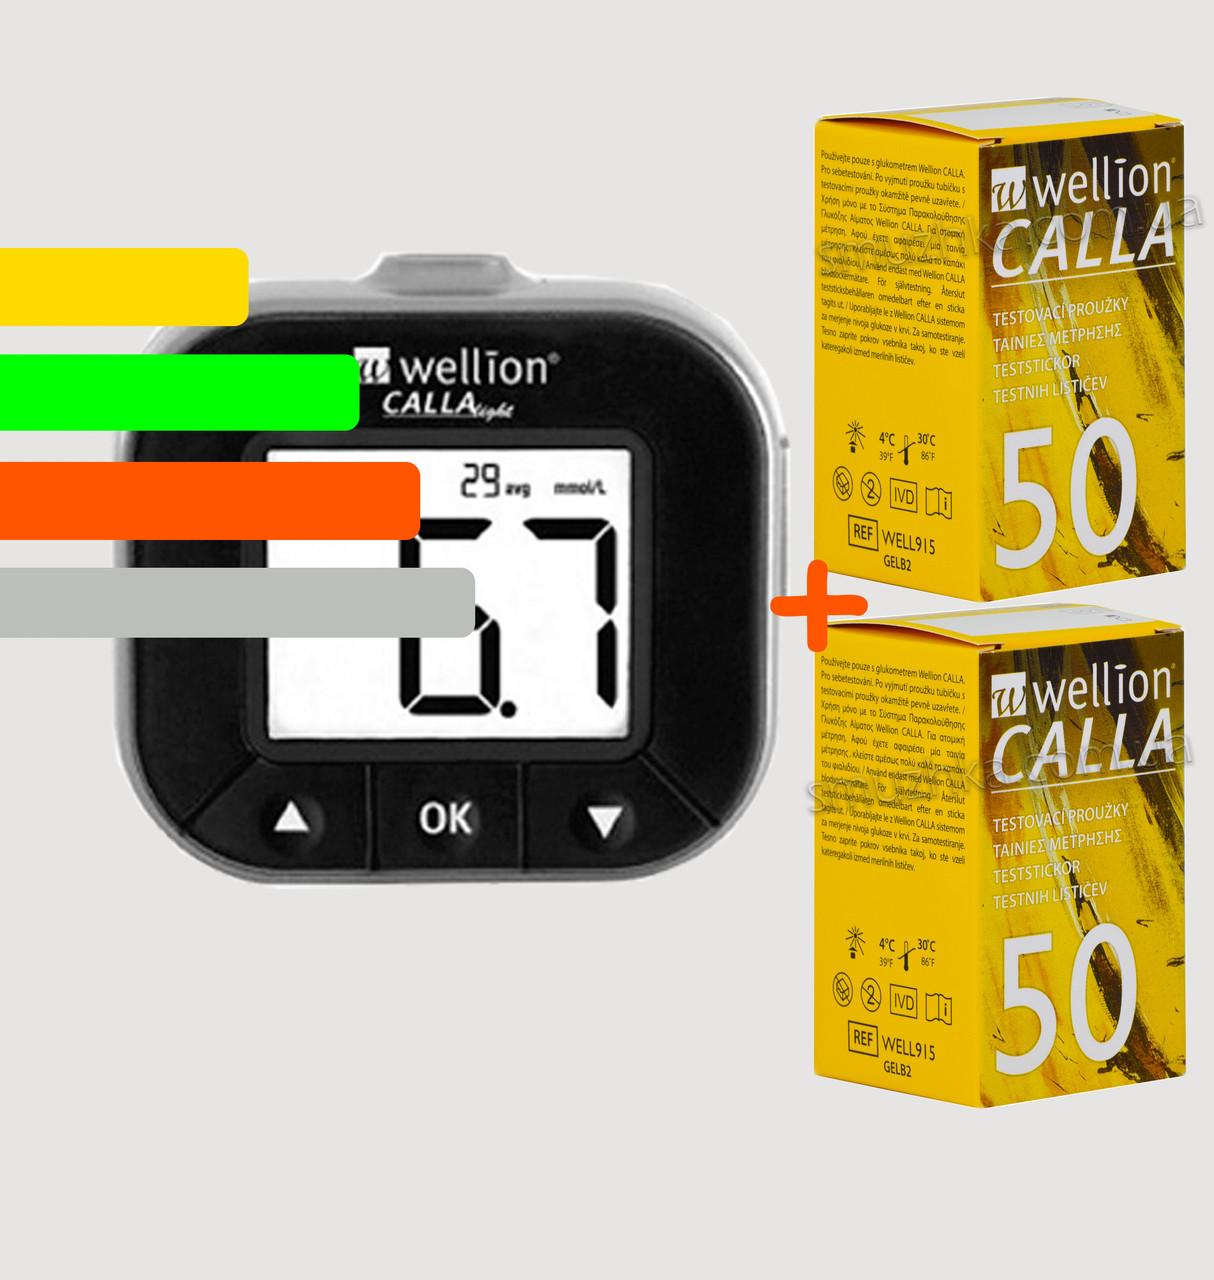 Глюкометр Wellion CALLA - Веллион Калла+100 тест-полосок